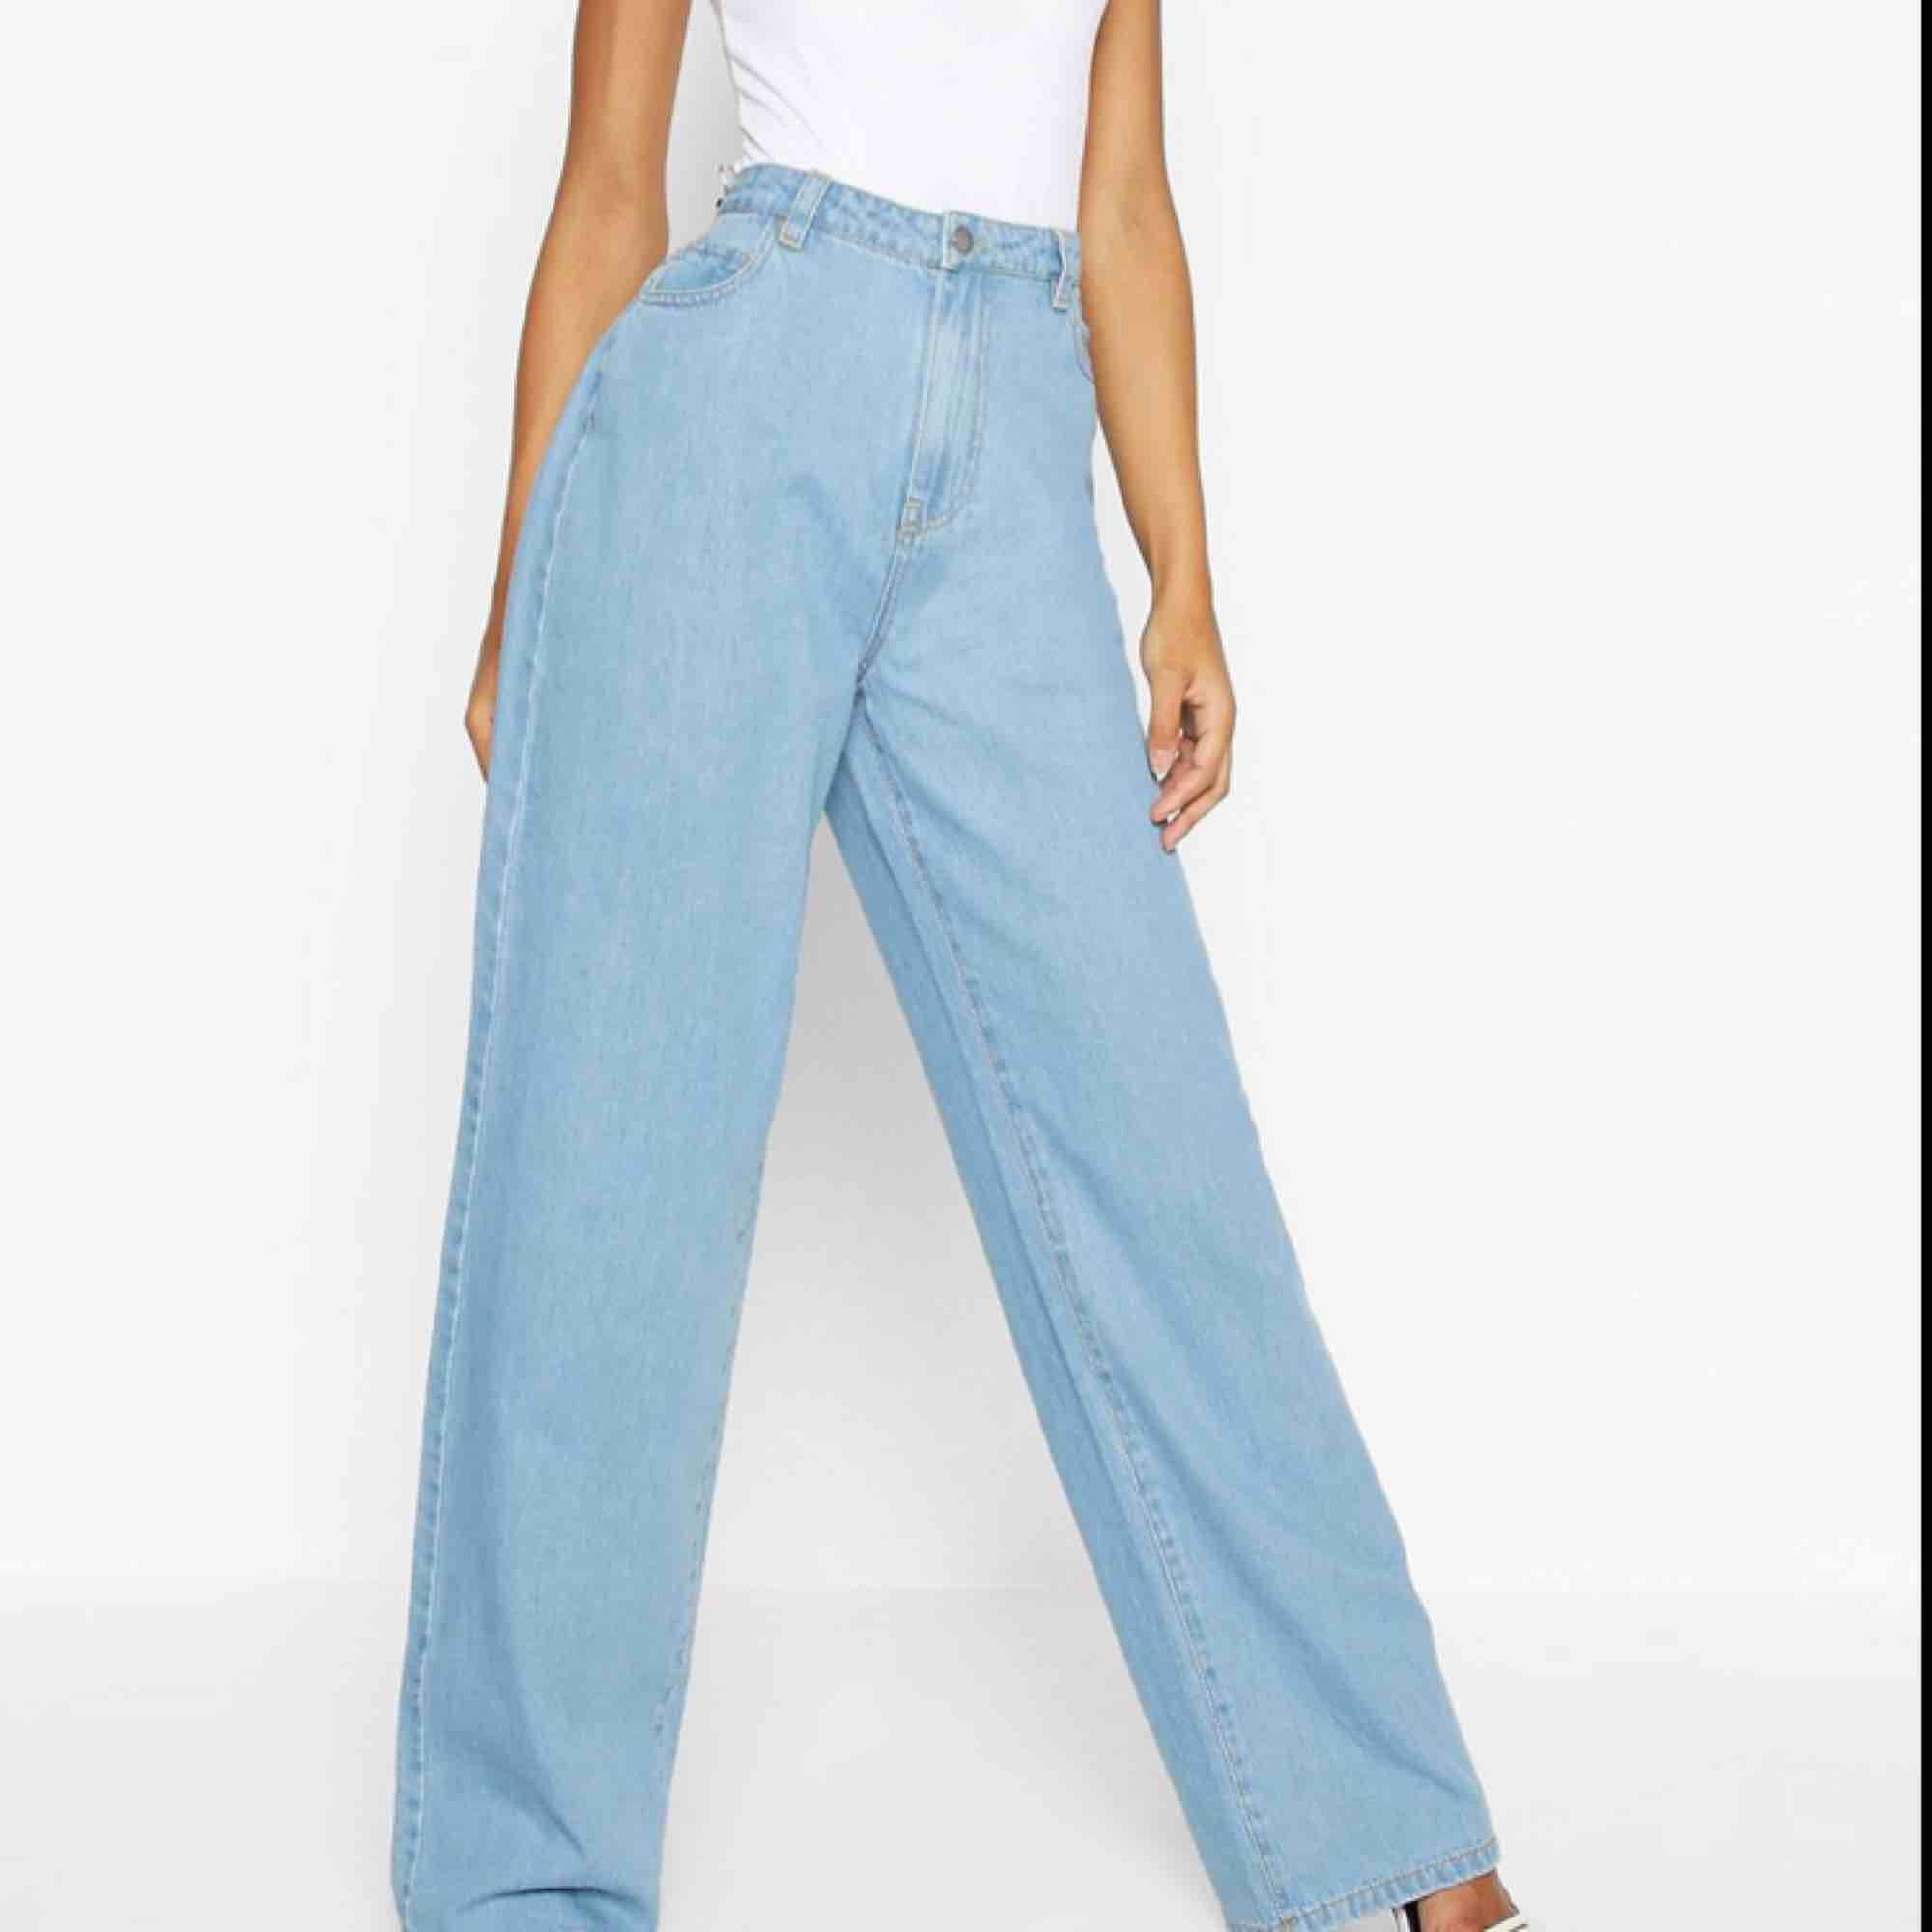 Helt nya jeans från boohoo✨✨. Jeans & Byxor.